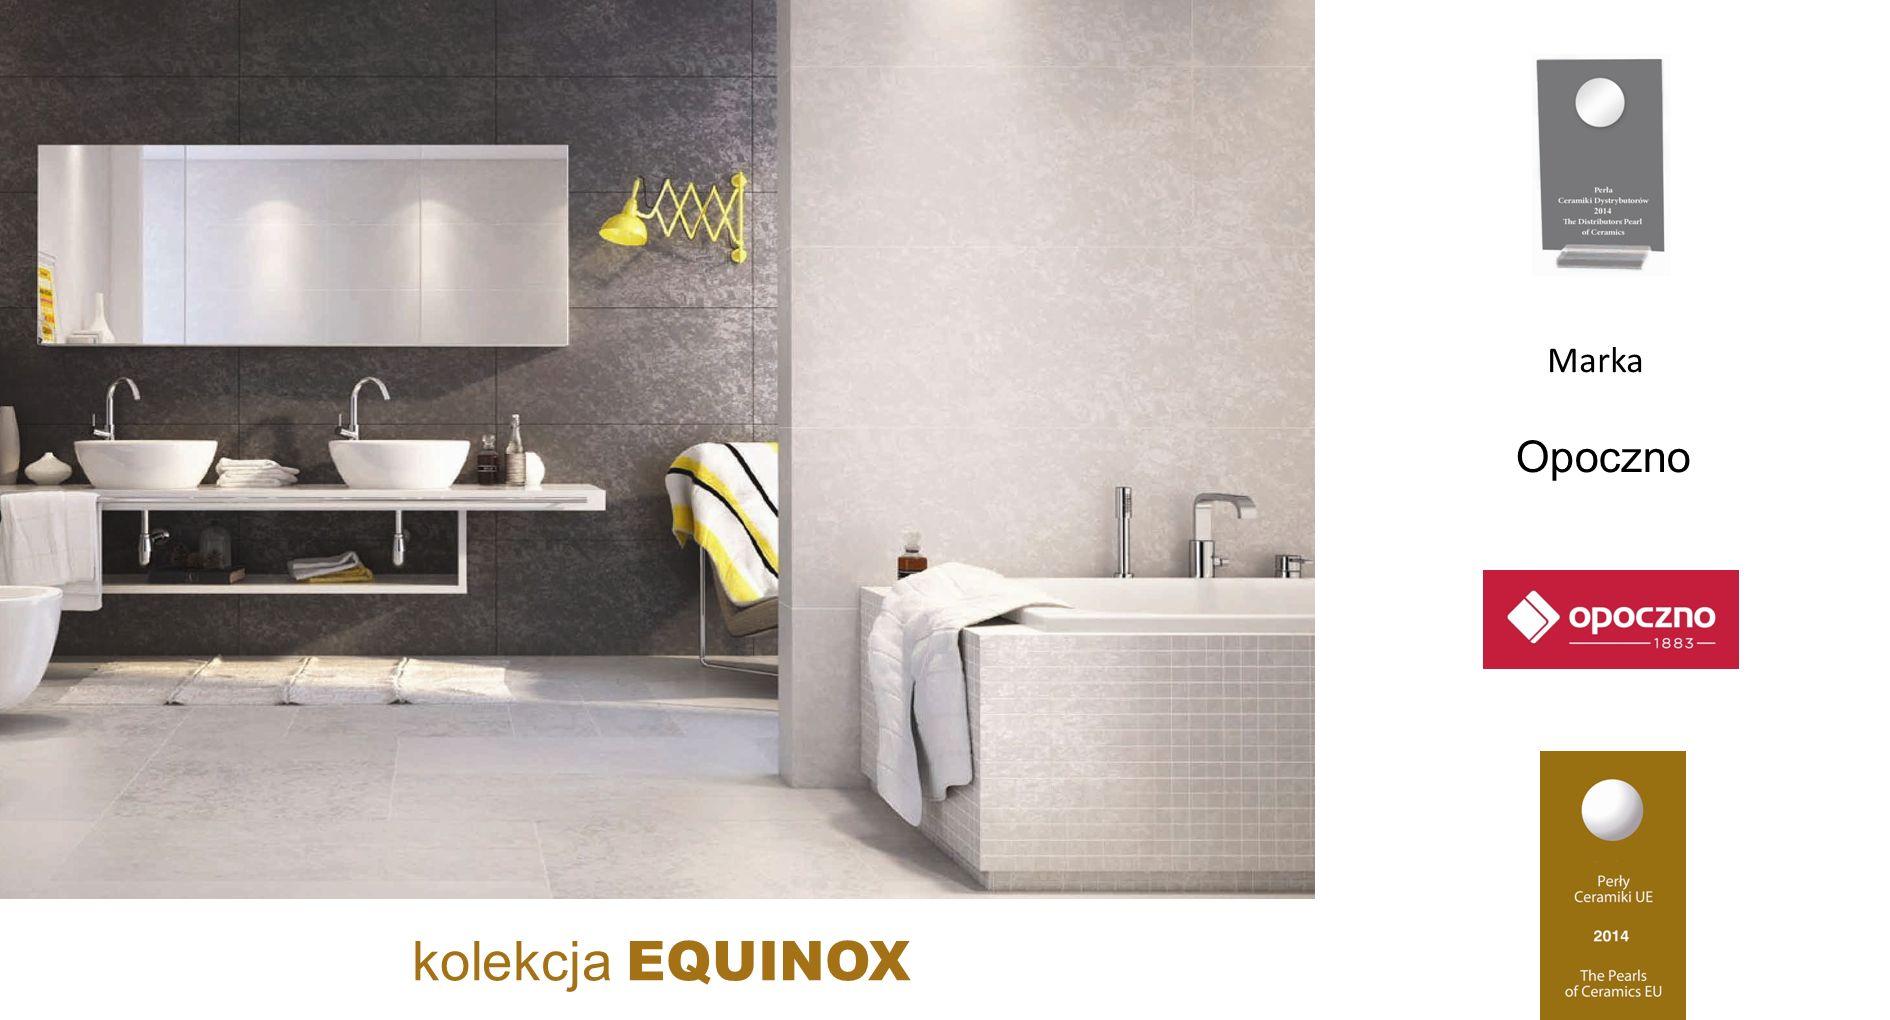 Opoczno kolekcja EQUINOX Marka